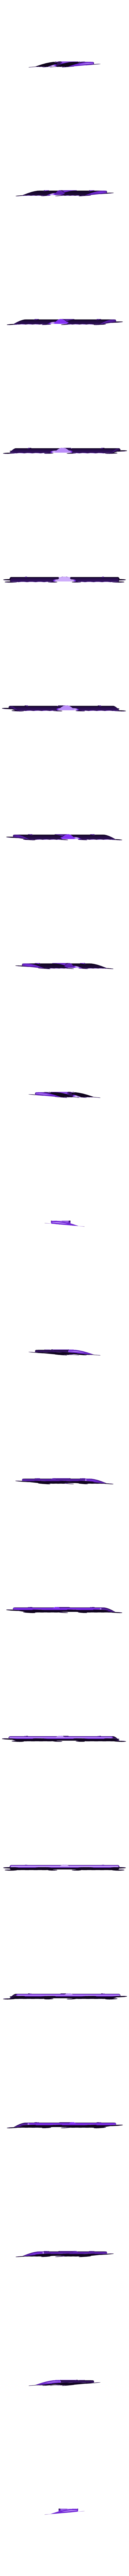 10-29-10007.STL Télécharger fichier STL gratuit Fokker DR.1 Triplane • Design imprimable en 3D, Ventwallader